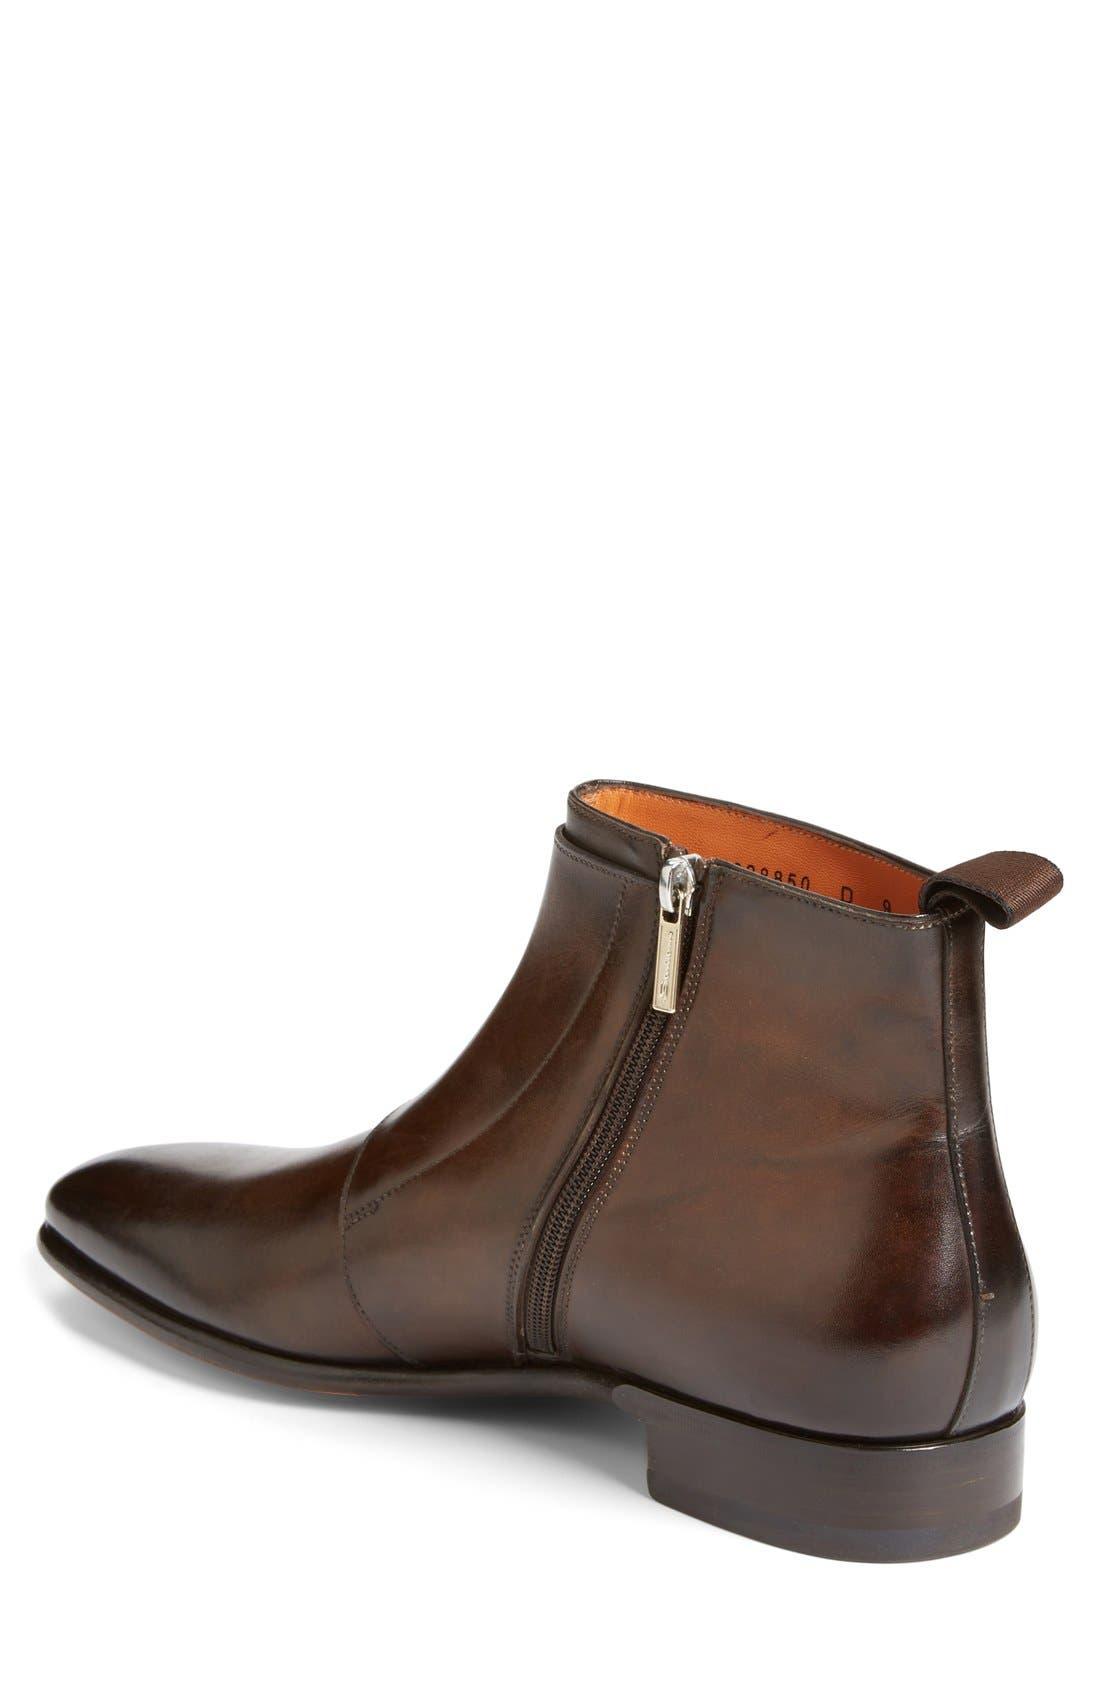 'Ciro' Double Monk Strap Boot,                             Alternate thumbnail 4, color,